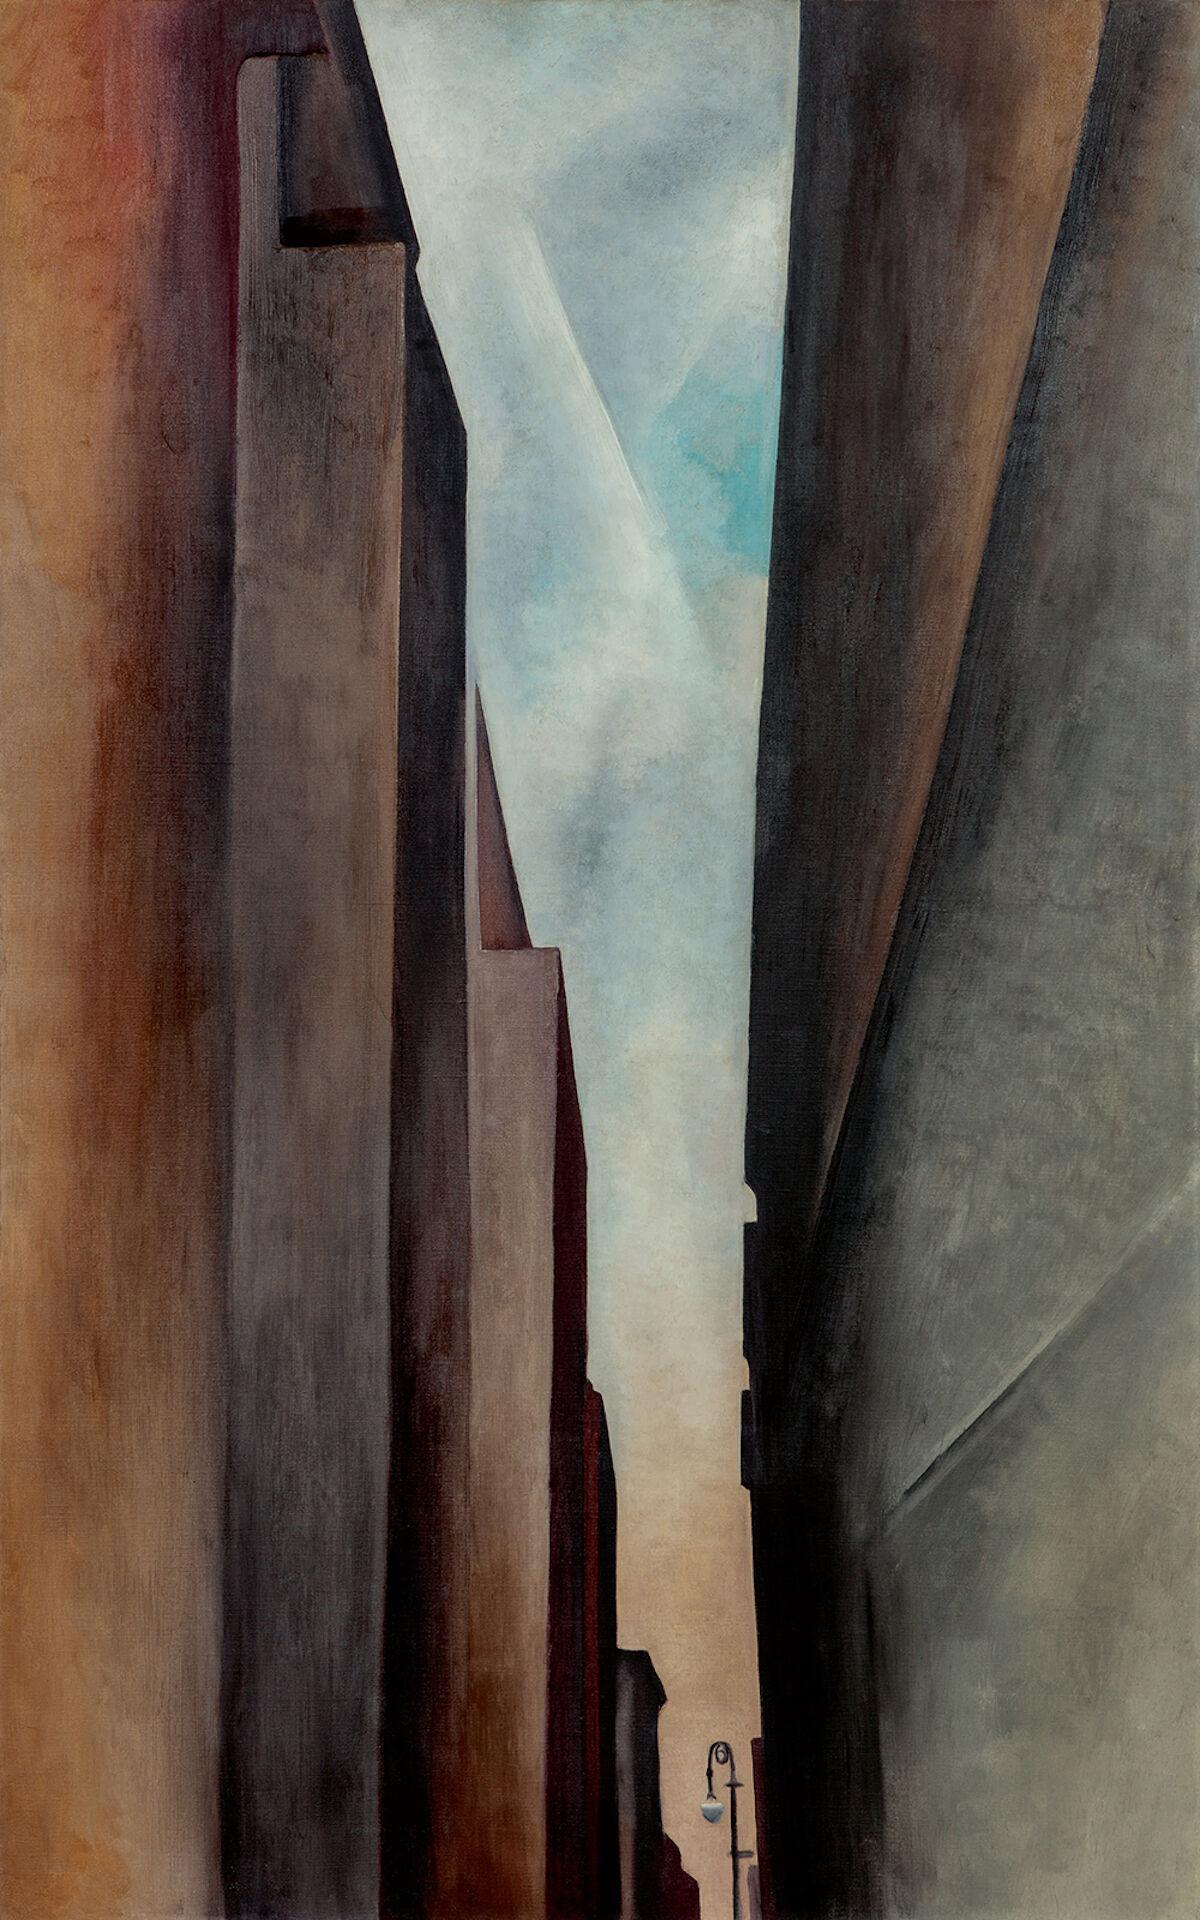 Georgia O'Keeffe, A Street, 1926. Est. $12–18 million. Courtesy Sotheby's